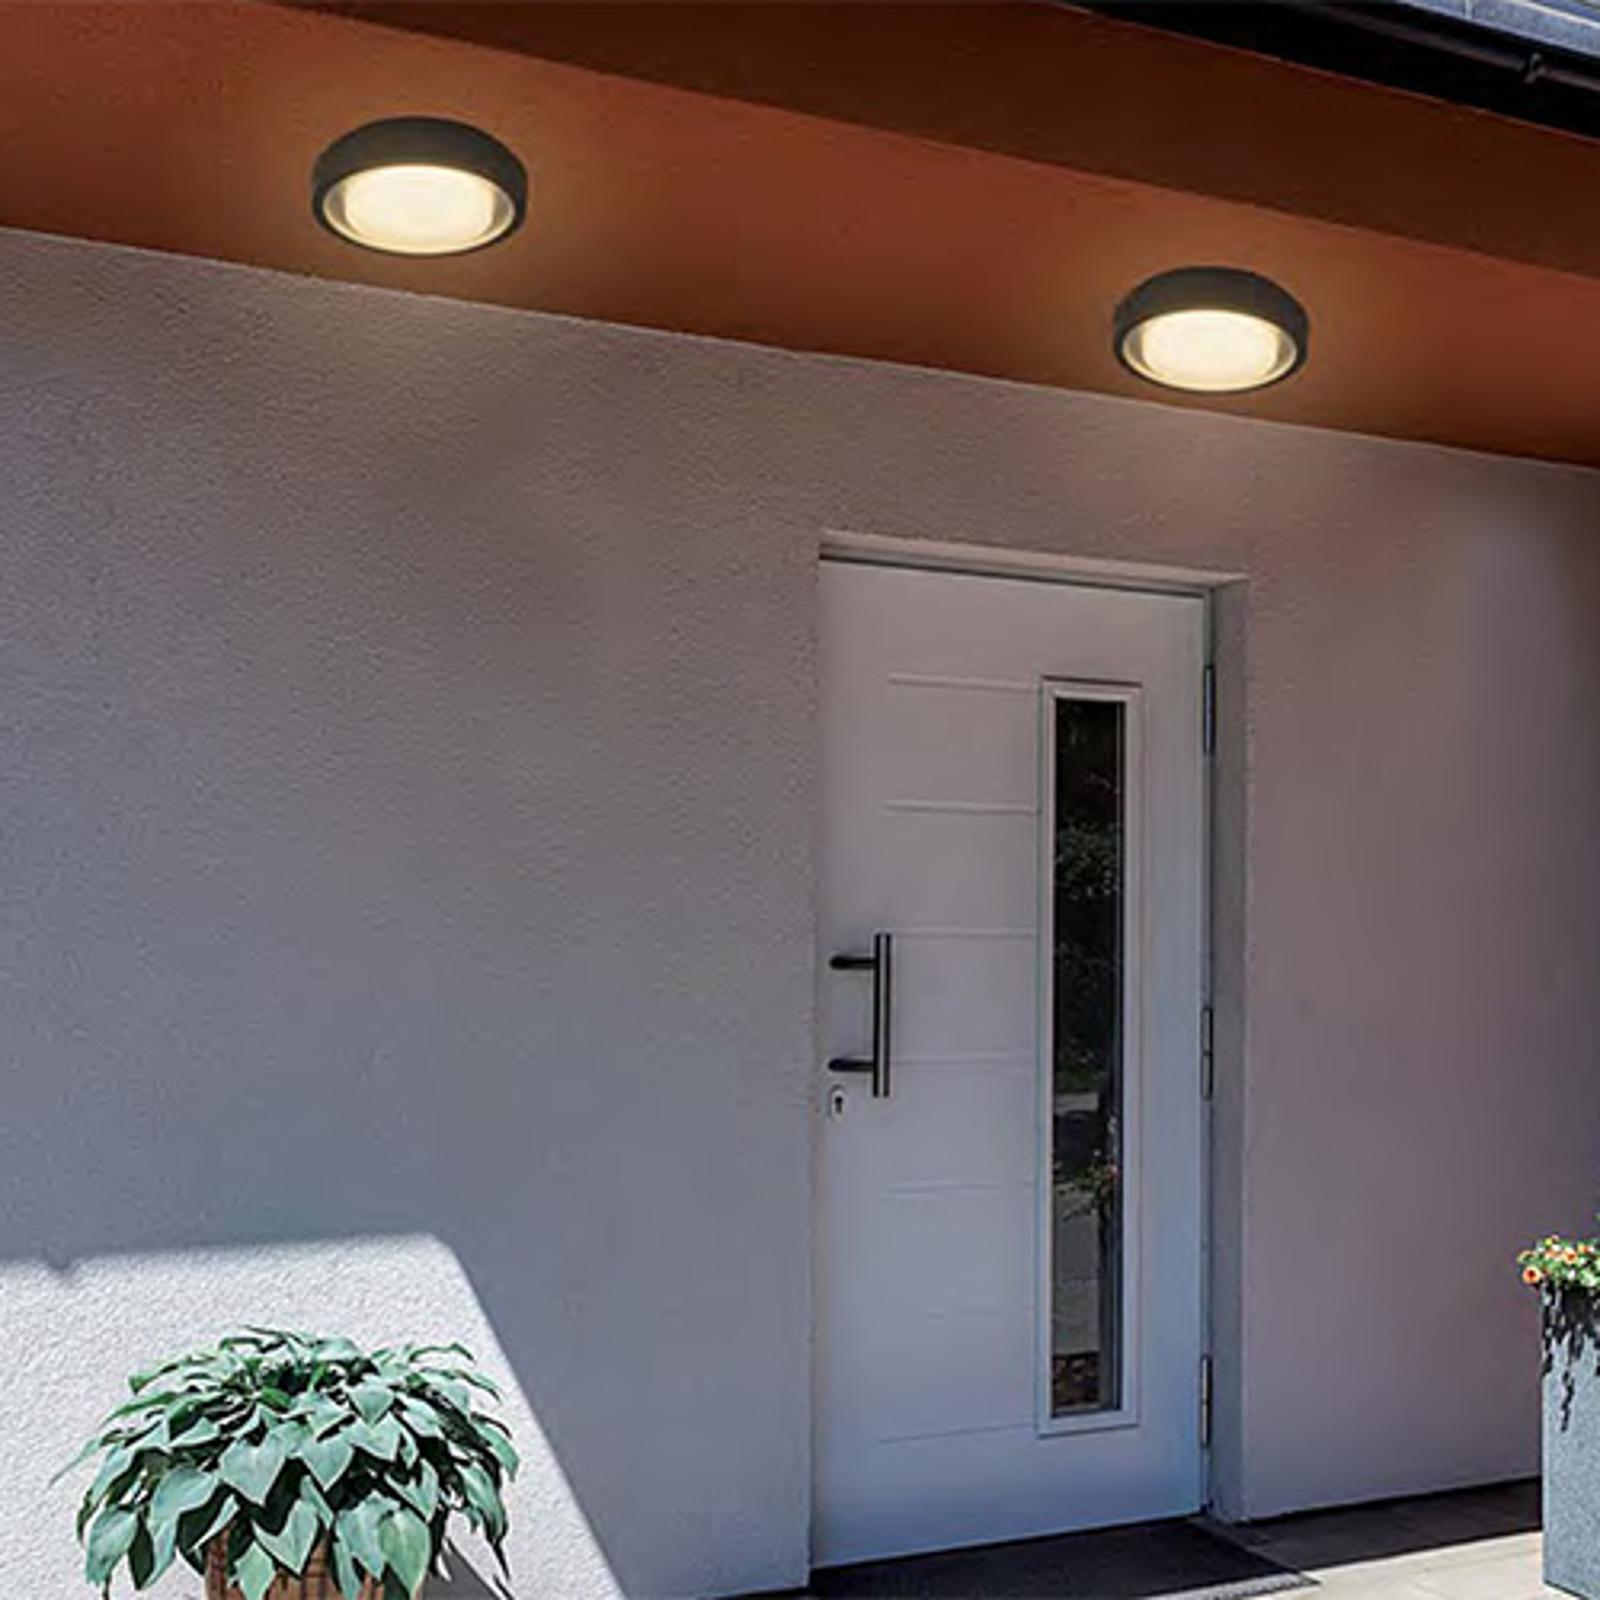 Compra Lámpara Led De Techo Para Exterior Toki Sensor Lampara Es